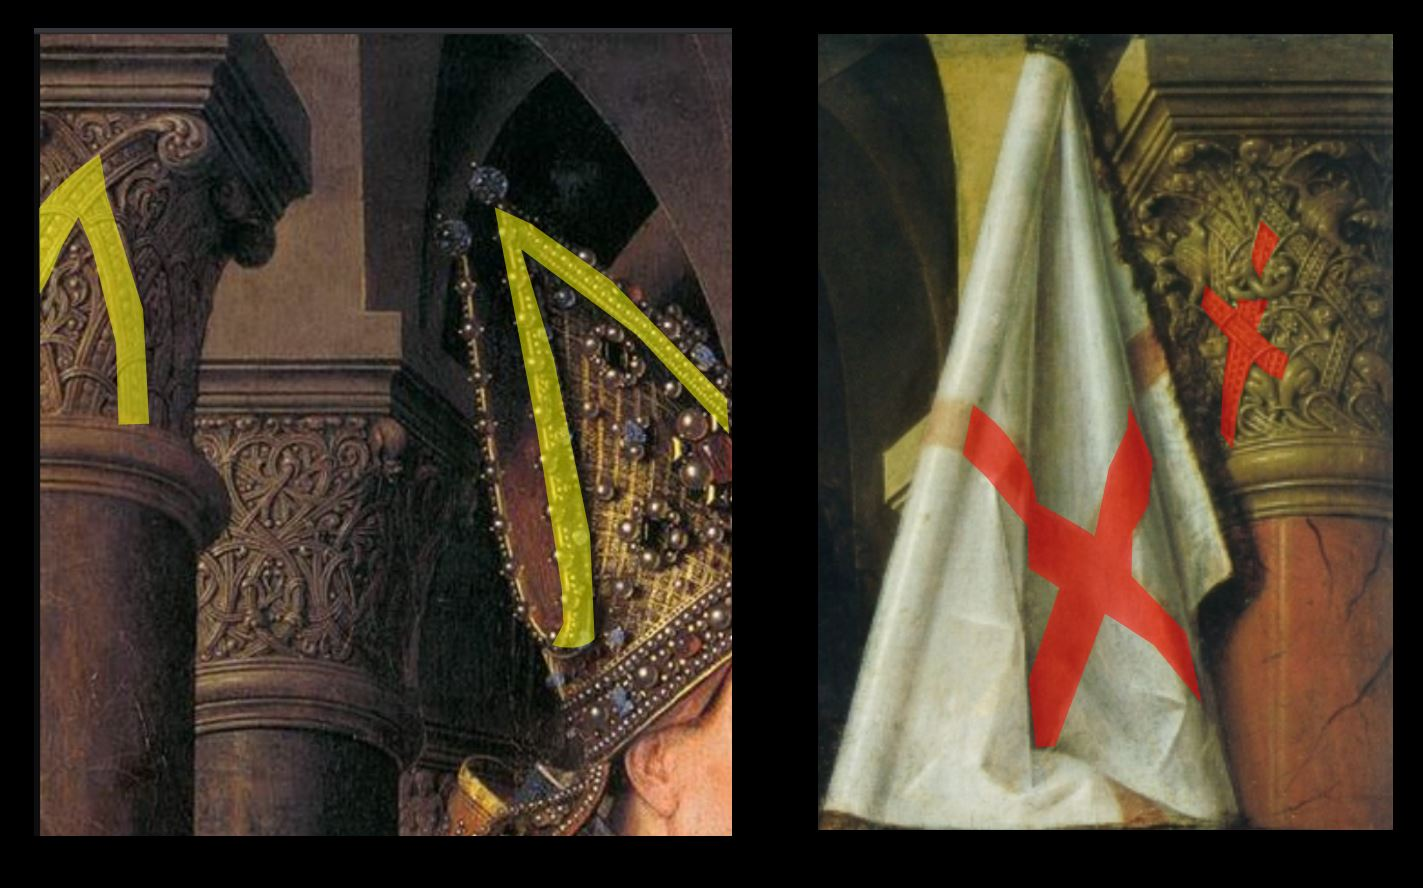 1434-36 Van Eyck La_Madone_au_Chanoine_Van_der_Paele Groeningemuseum, Bruges schema continuite 2